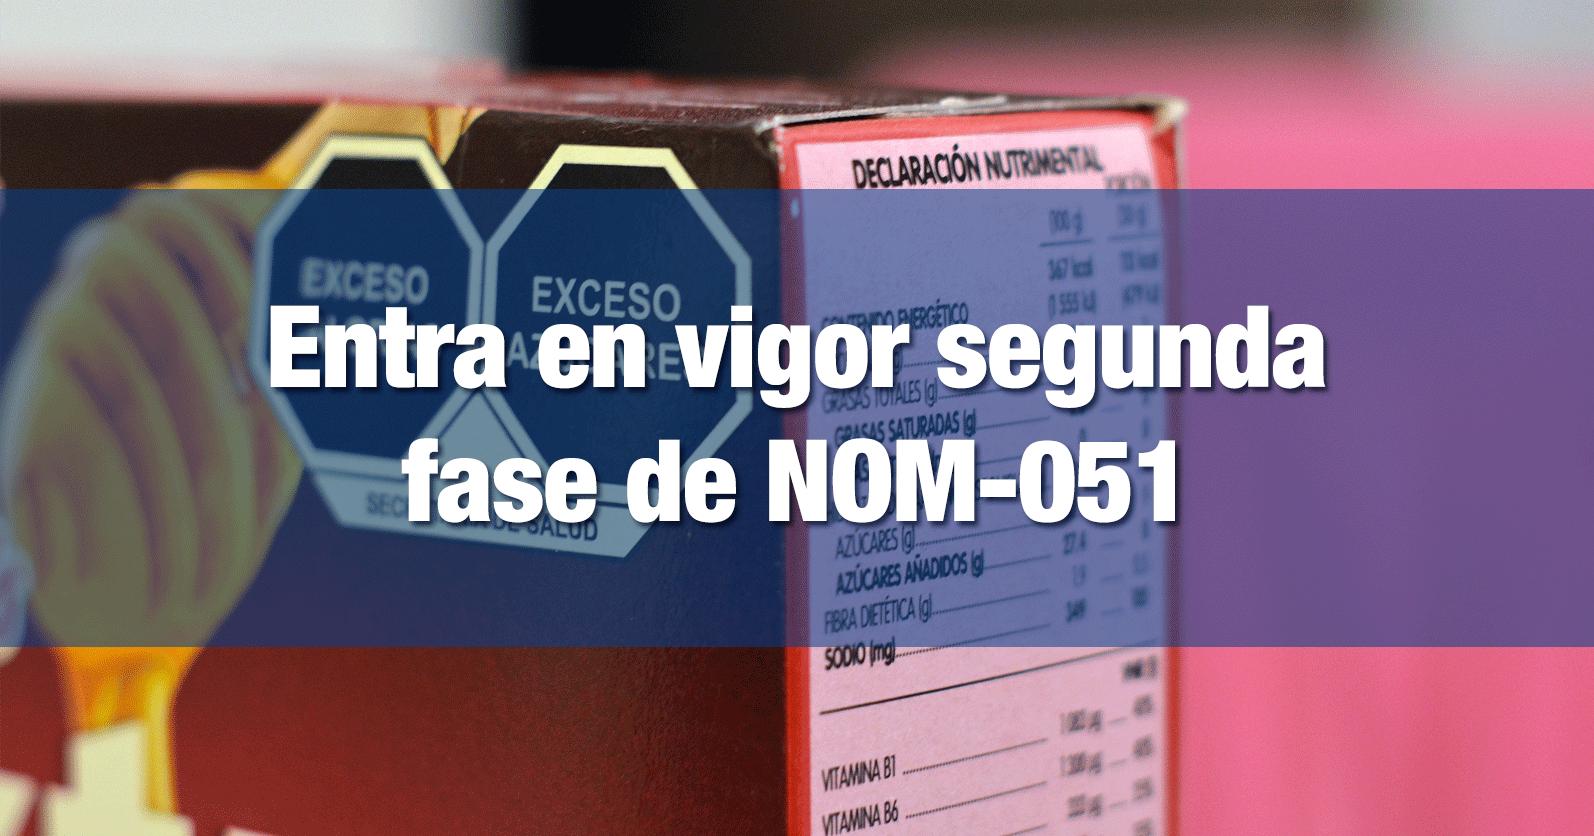 Entra en vigor segunda fase de NOM-051